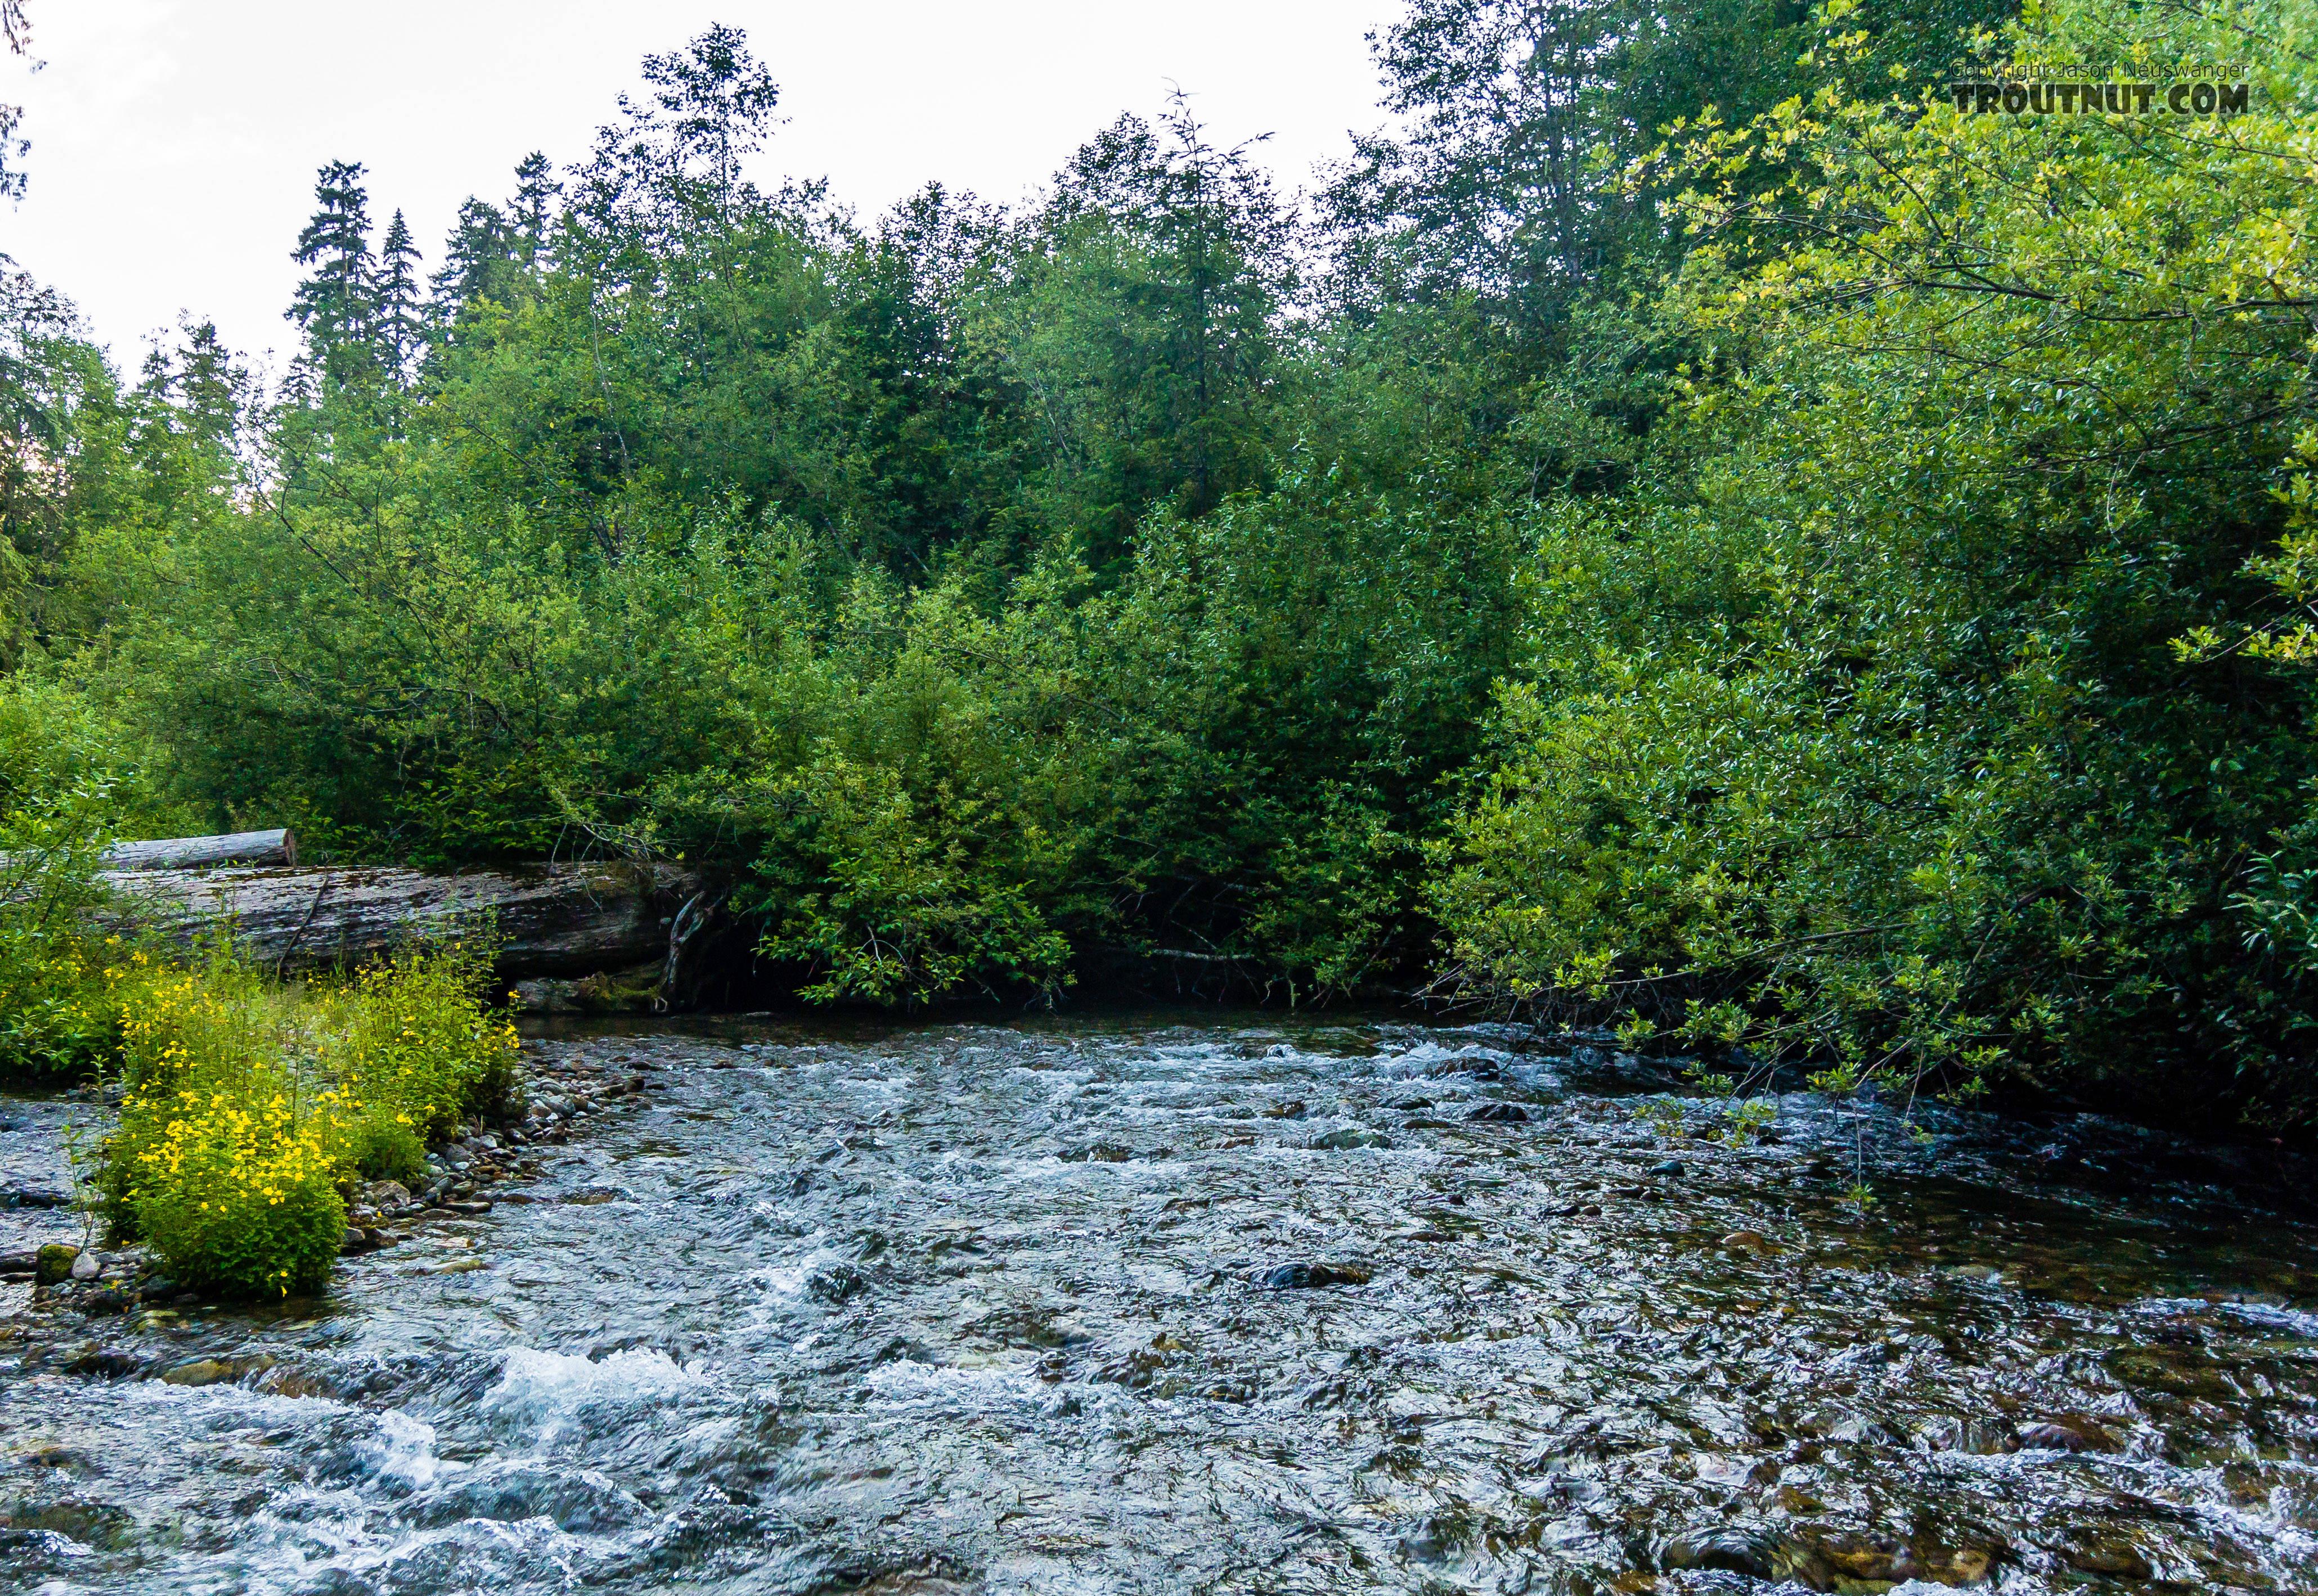 From Huckleberry Creek in Washington.